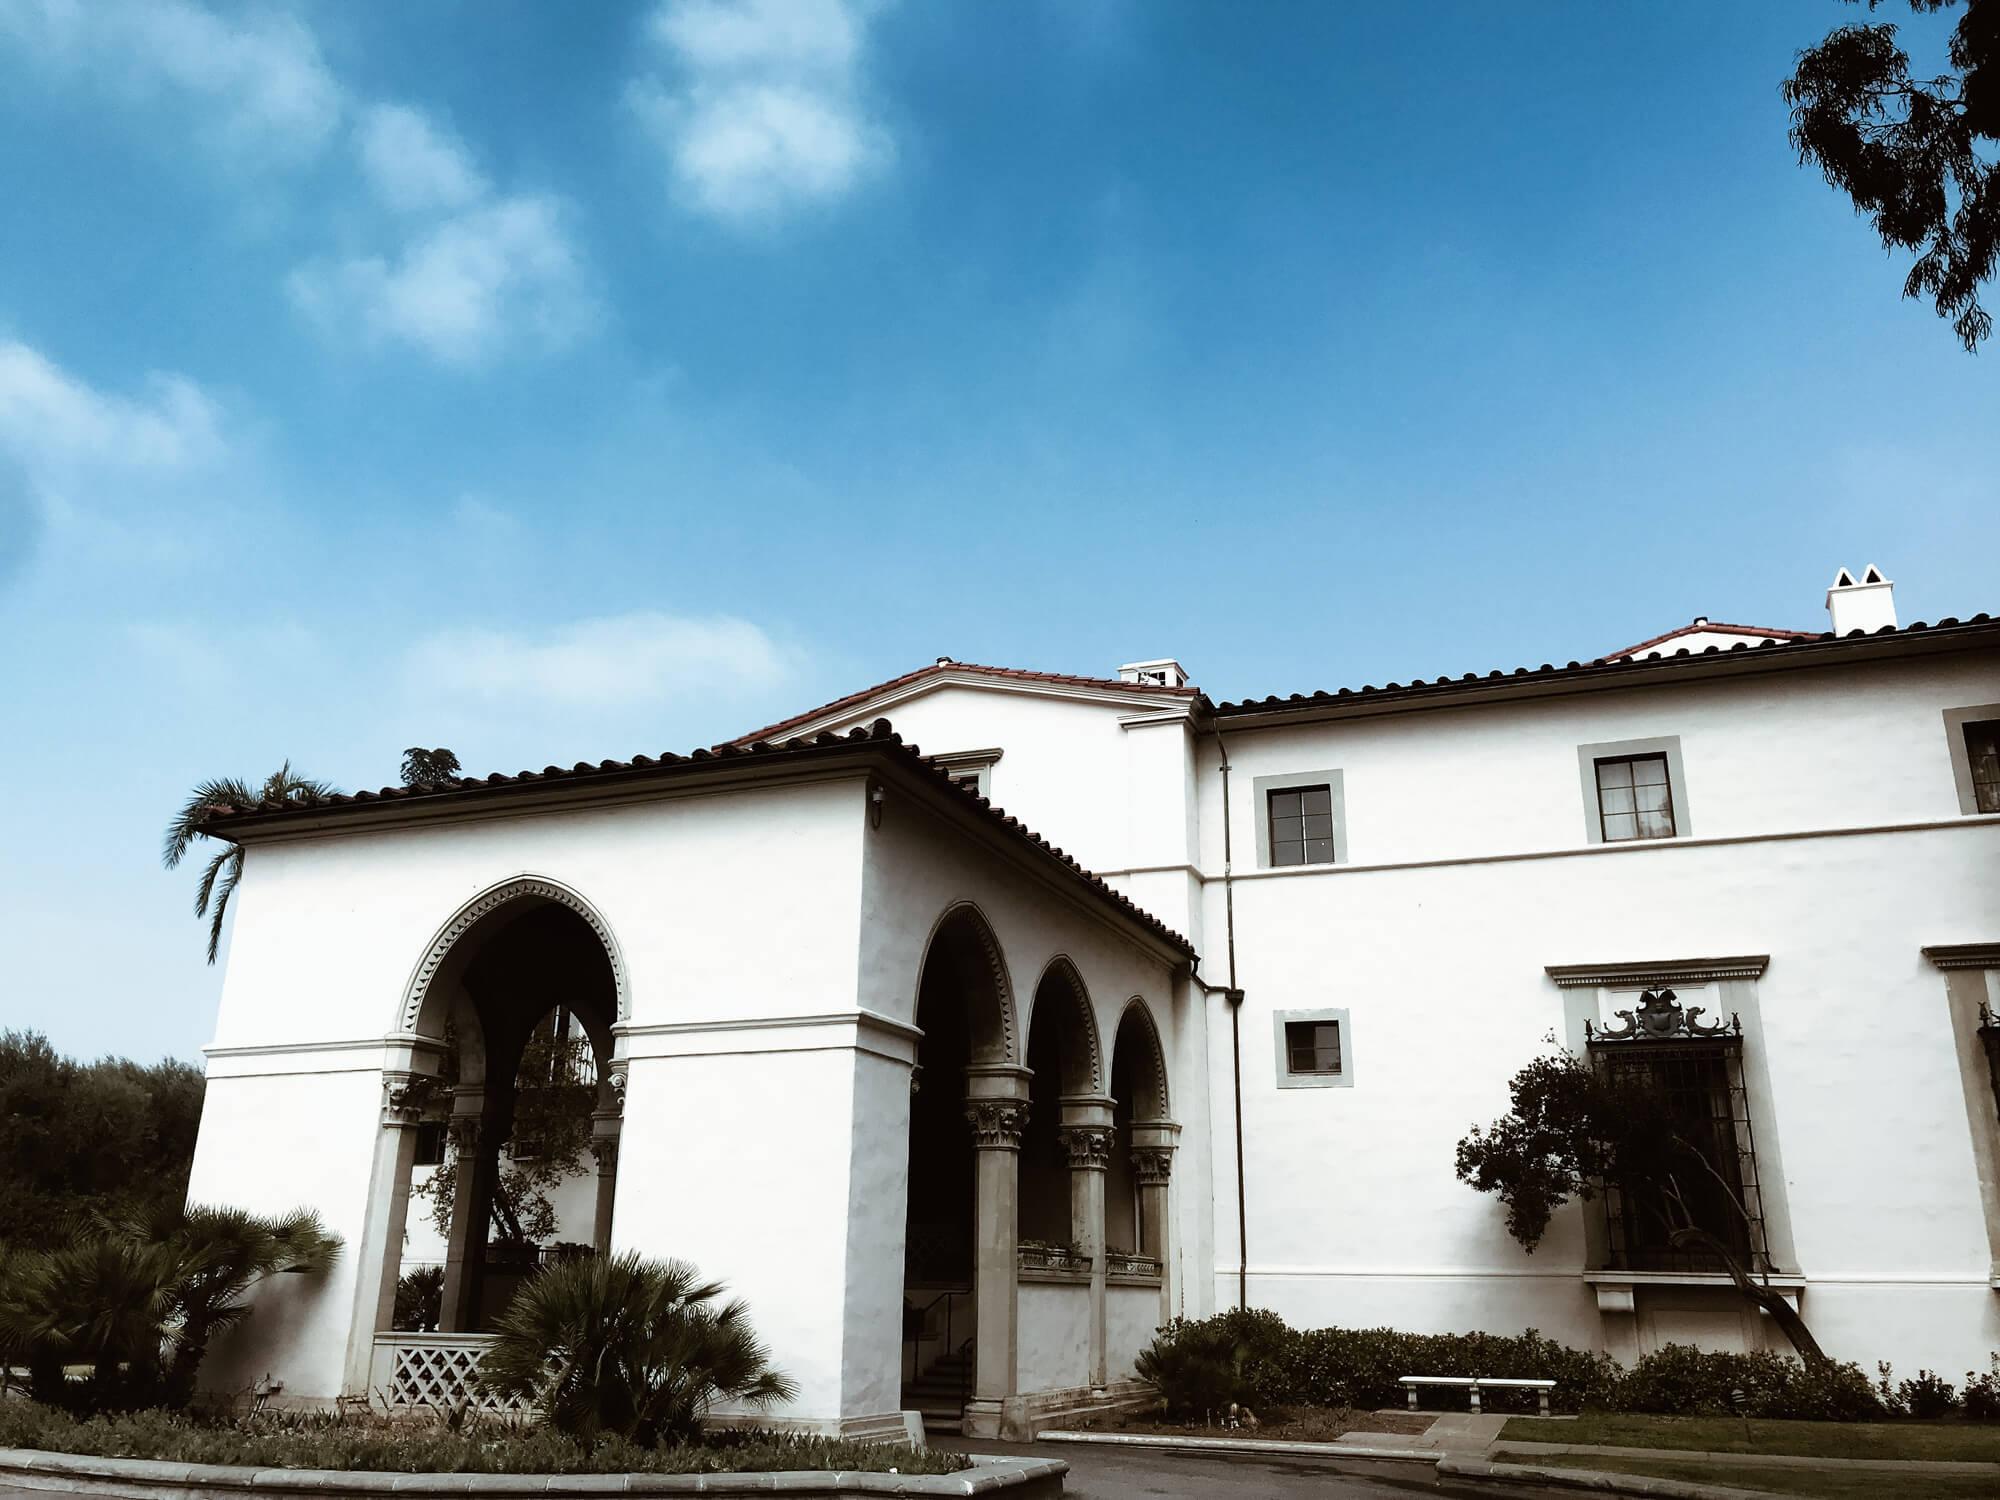 Caltech - Athenaeum